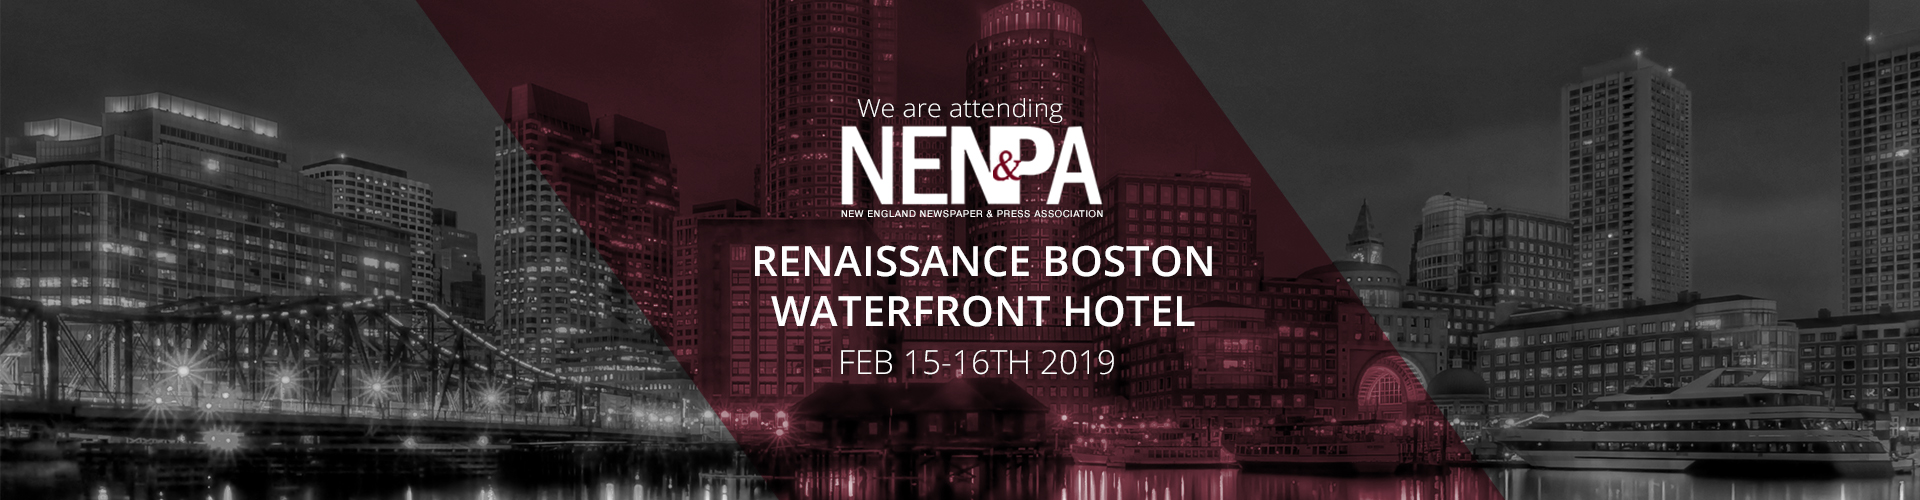 New England Newspaper Convention (NENPA)